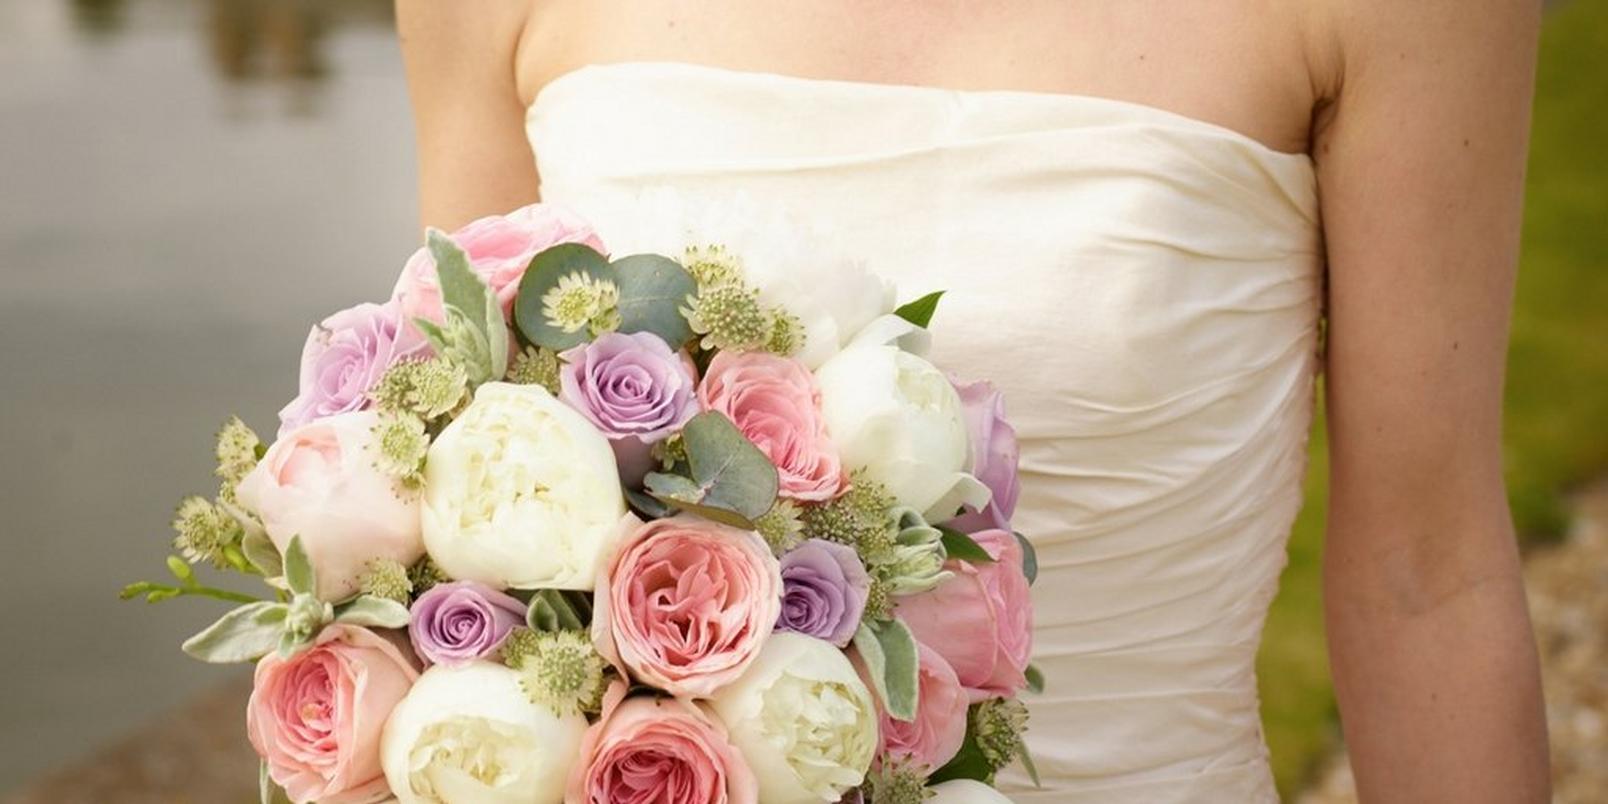 the-hidden-symbolism-in-your-wedding-bouquet-3